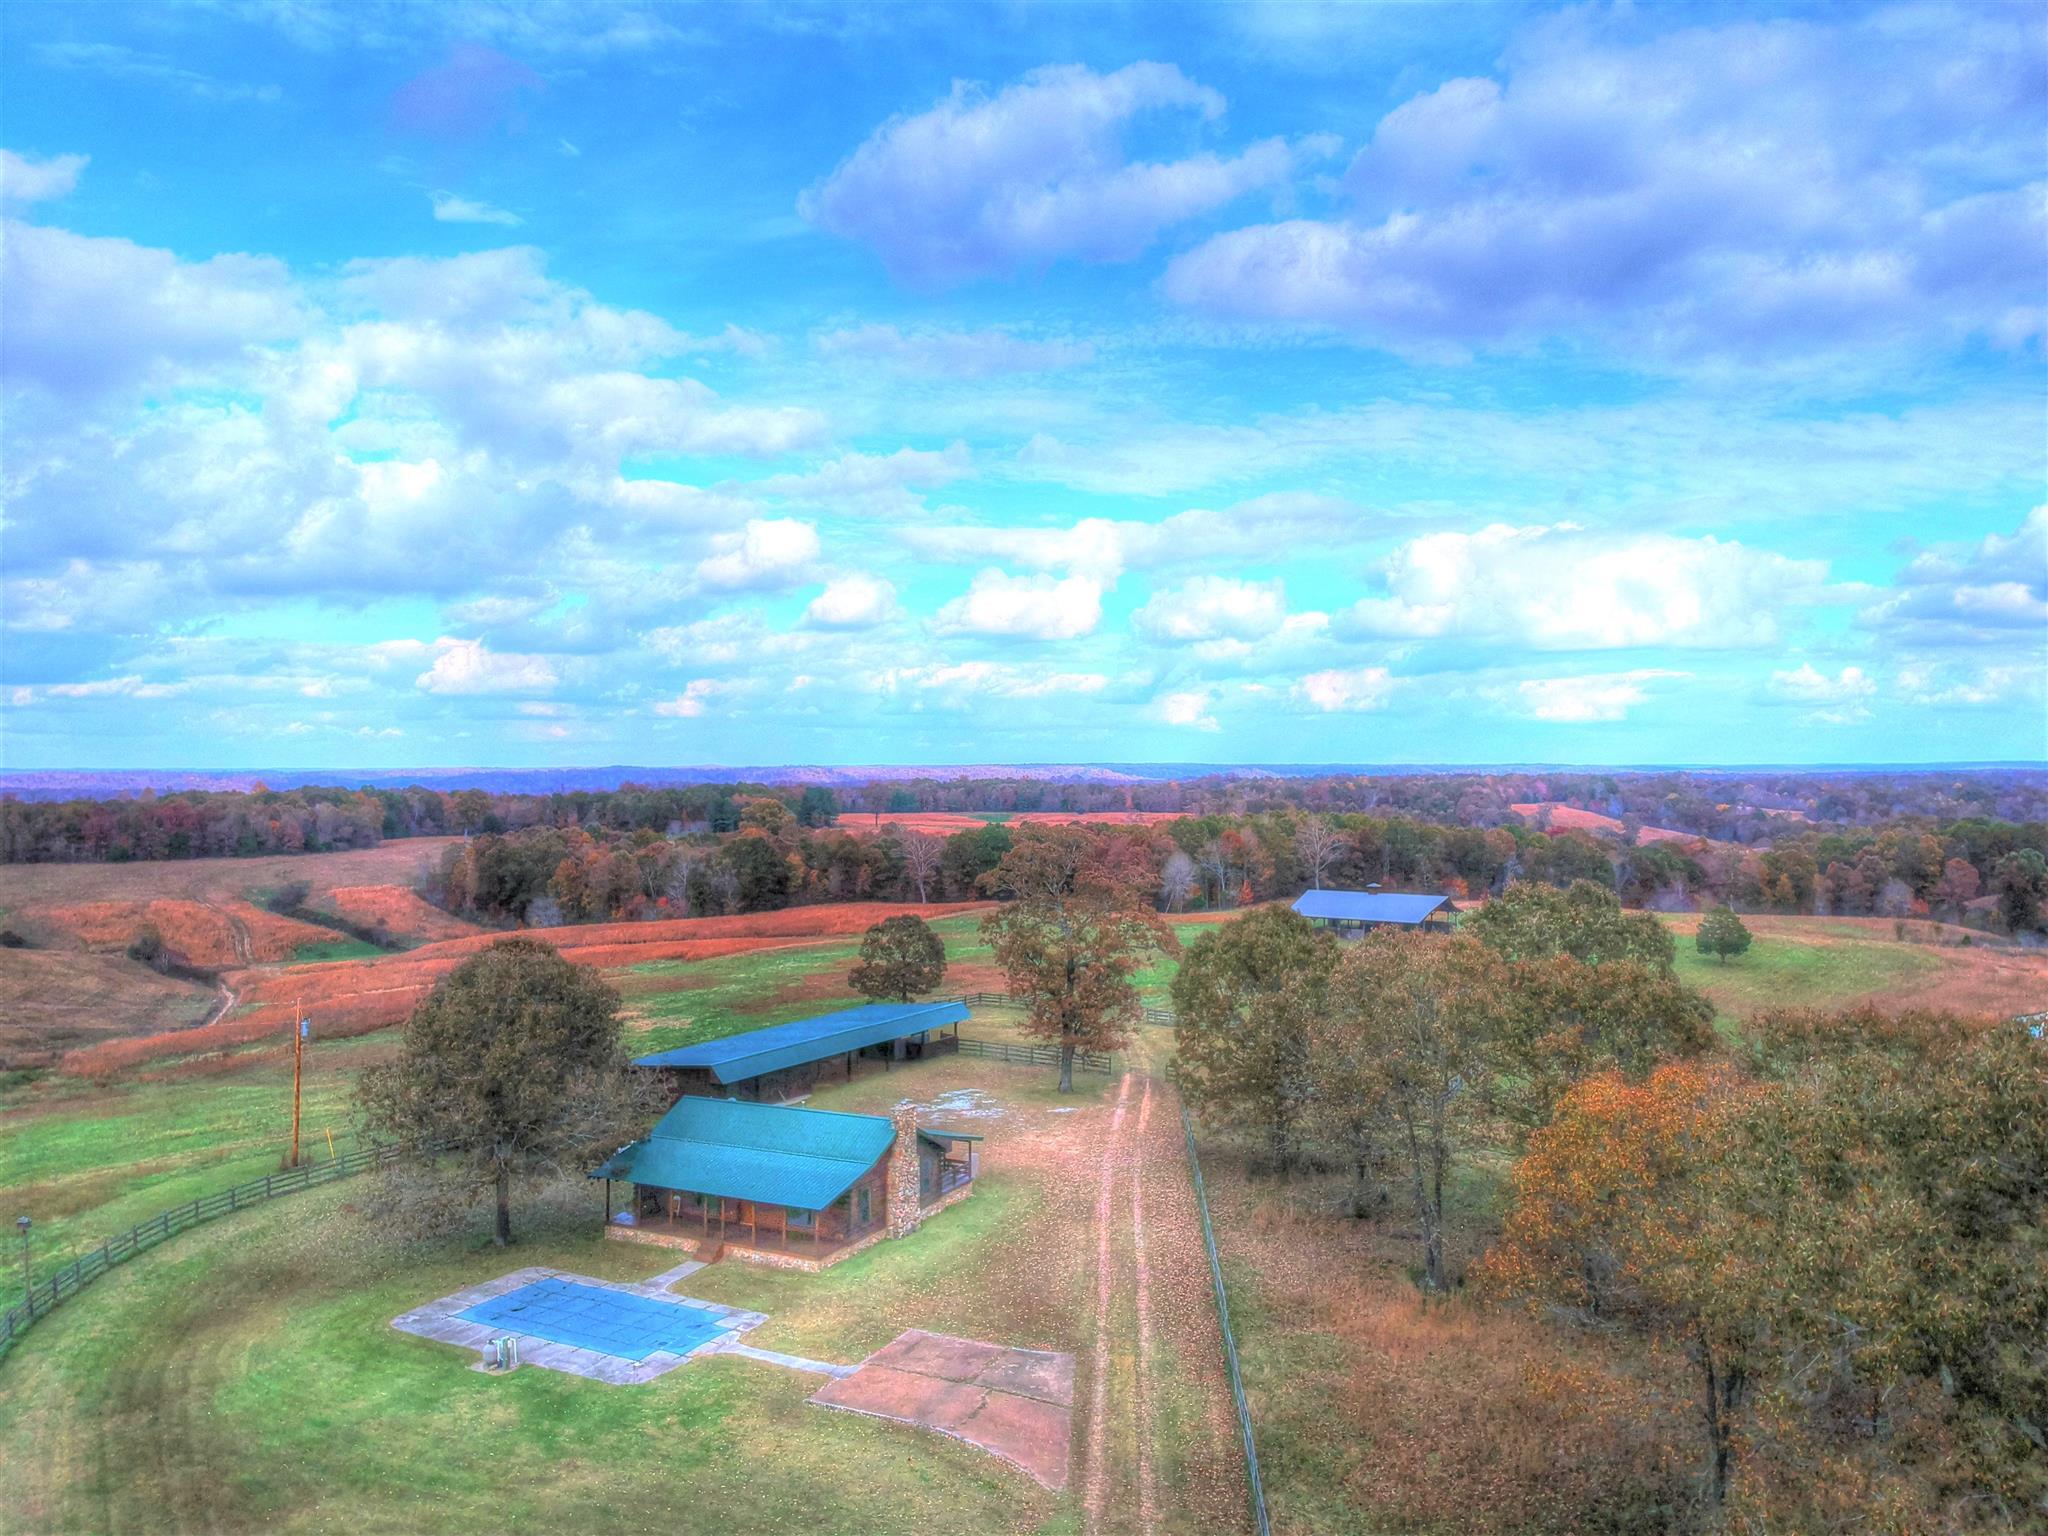 2173 Barren Hollow Rd, Hurricane Mills, TN 37078 - Hurricane Mills, TN real estate listing